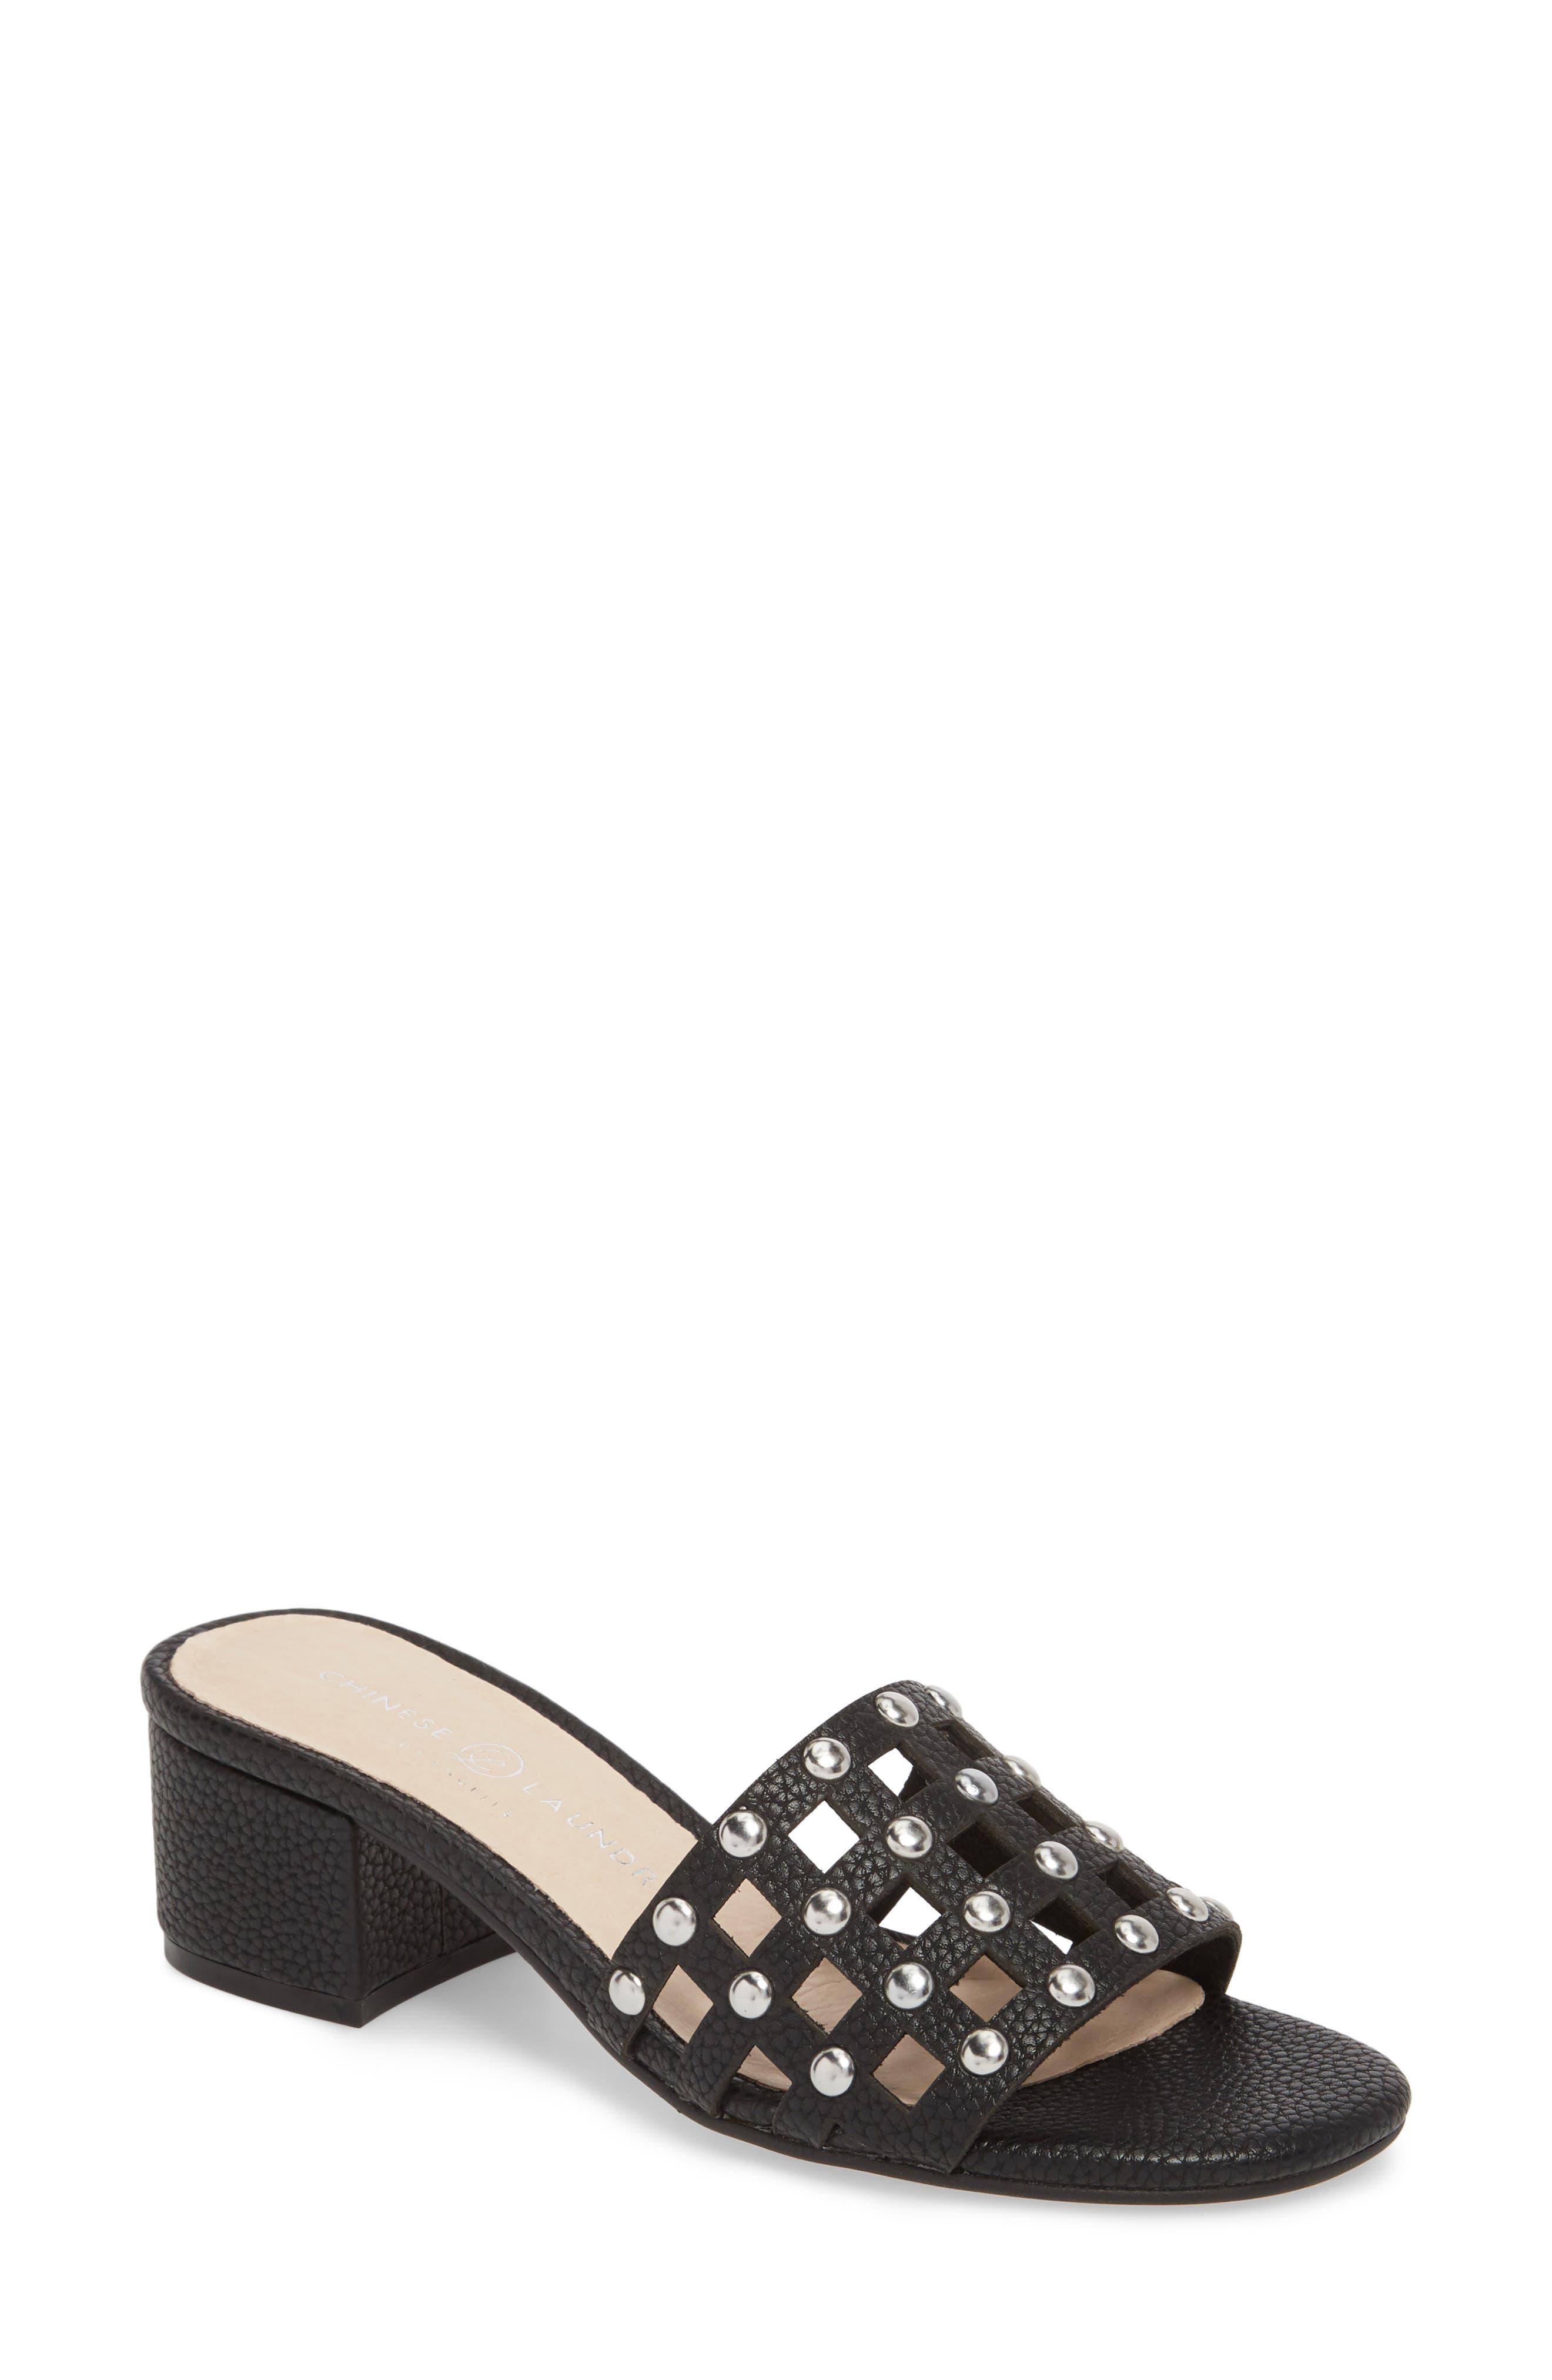 Megs Slide Sandal,                         Main,                         color, BLACK